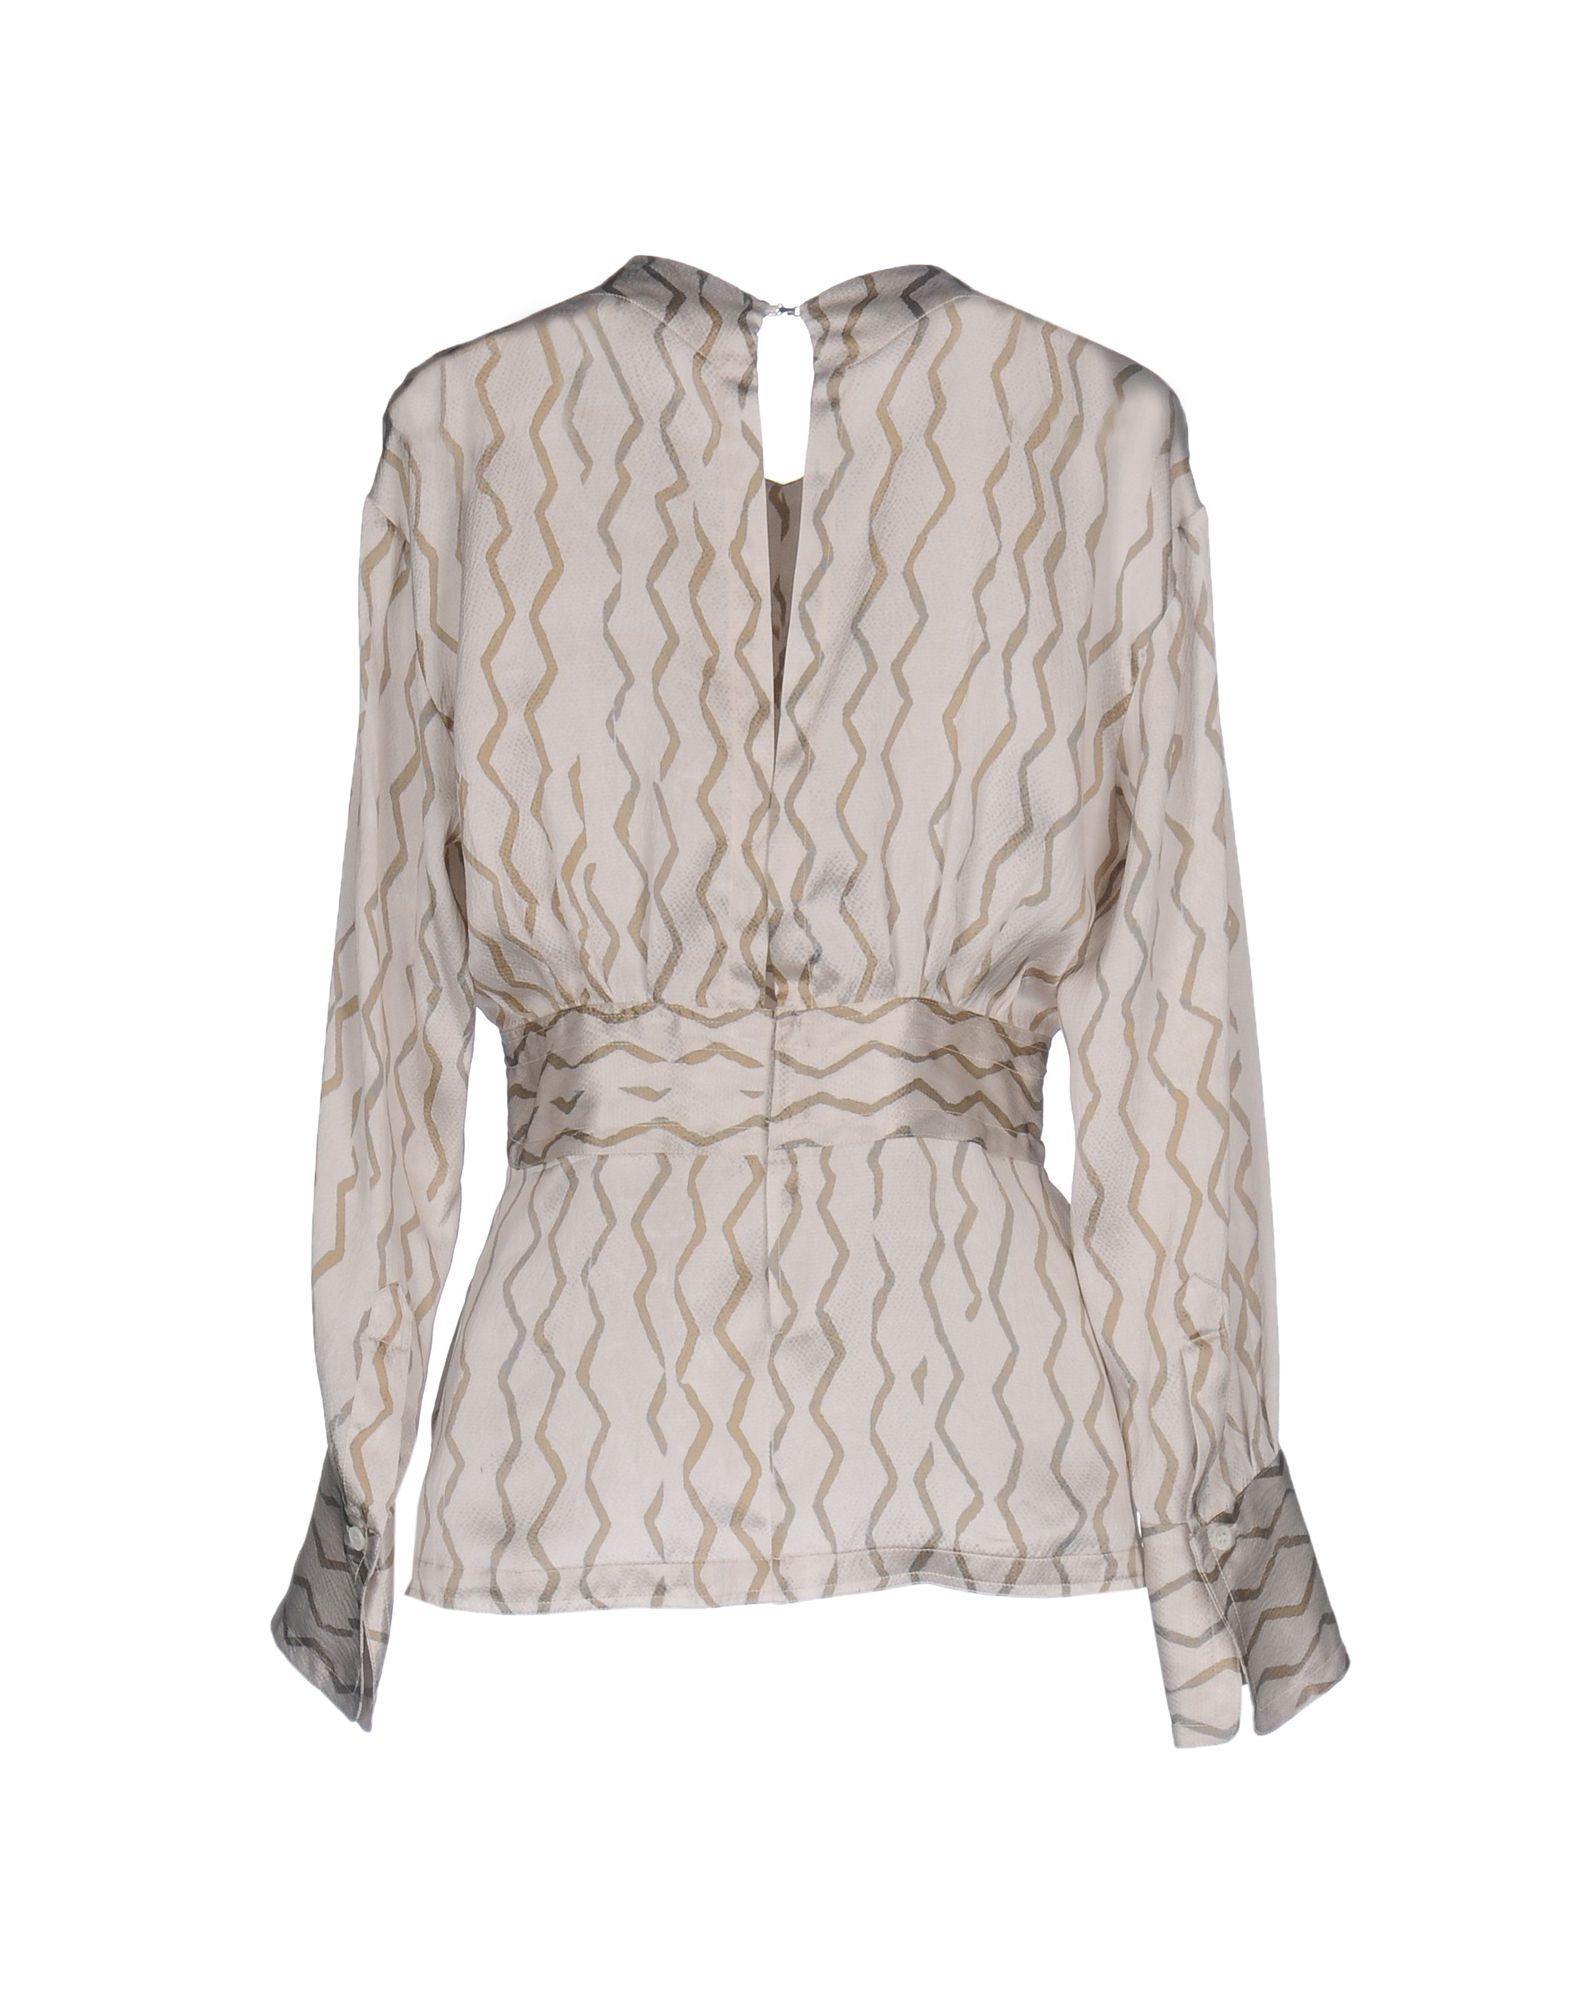 Isabel Marant Light Grey Print Silk Blouse